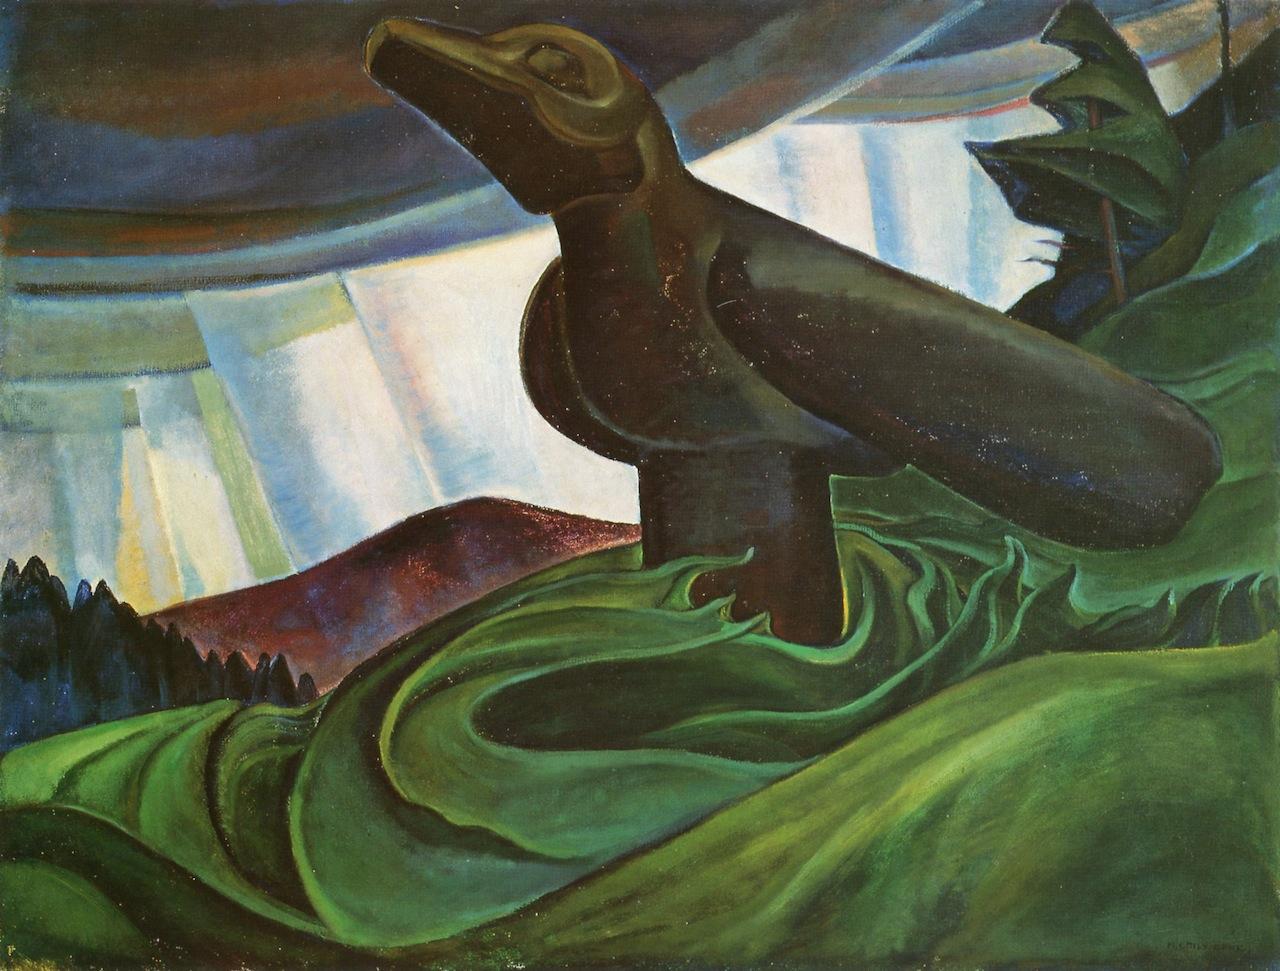 Emily Carr Big raven, 1931 86.7 x 113.8 cm Oil on canvas